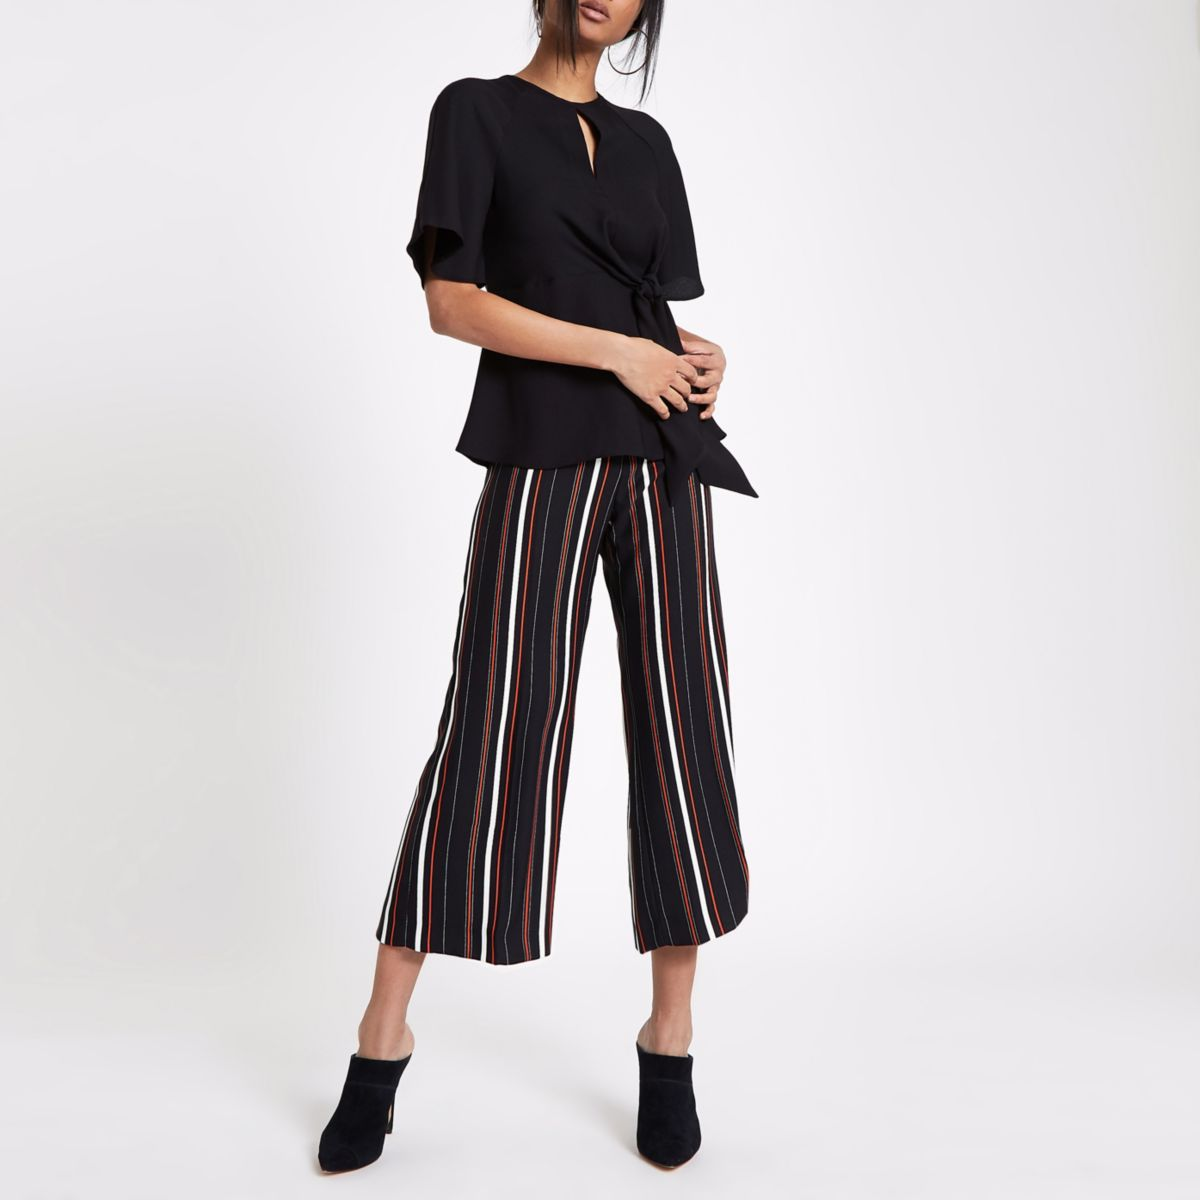 Black Short Sleeve Tie Front Blouse                                  Black Short Sleeve Tie Front Blouse by River Island